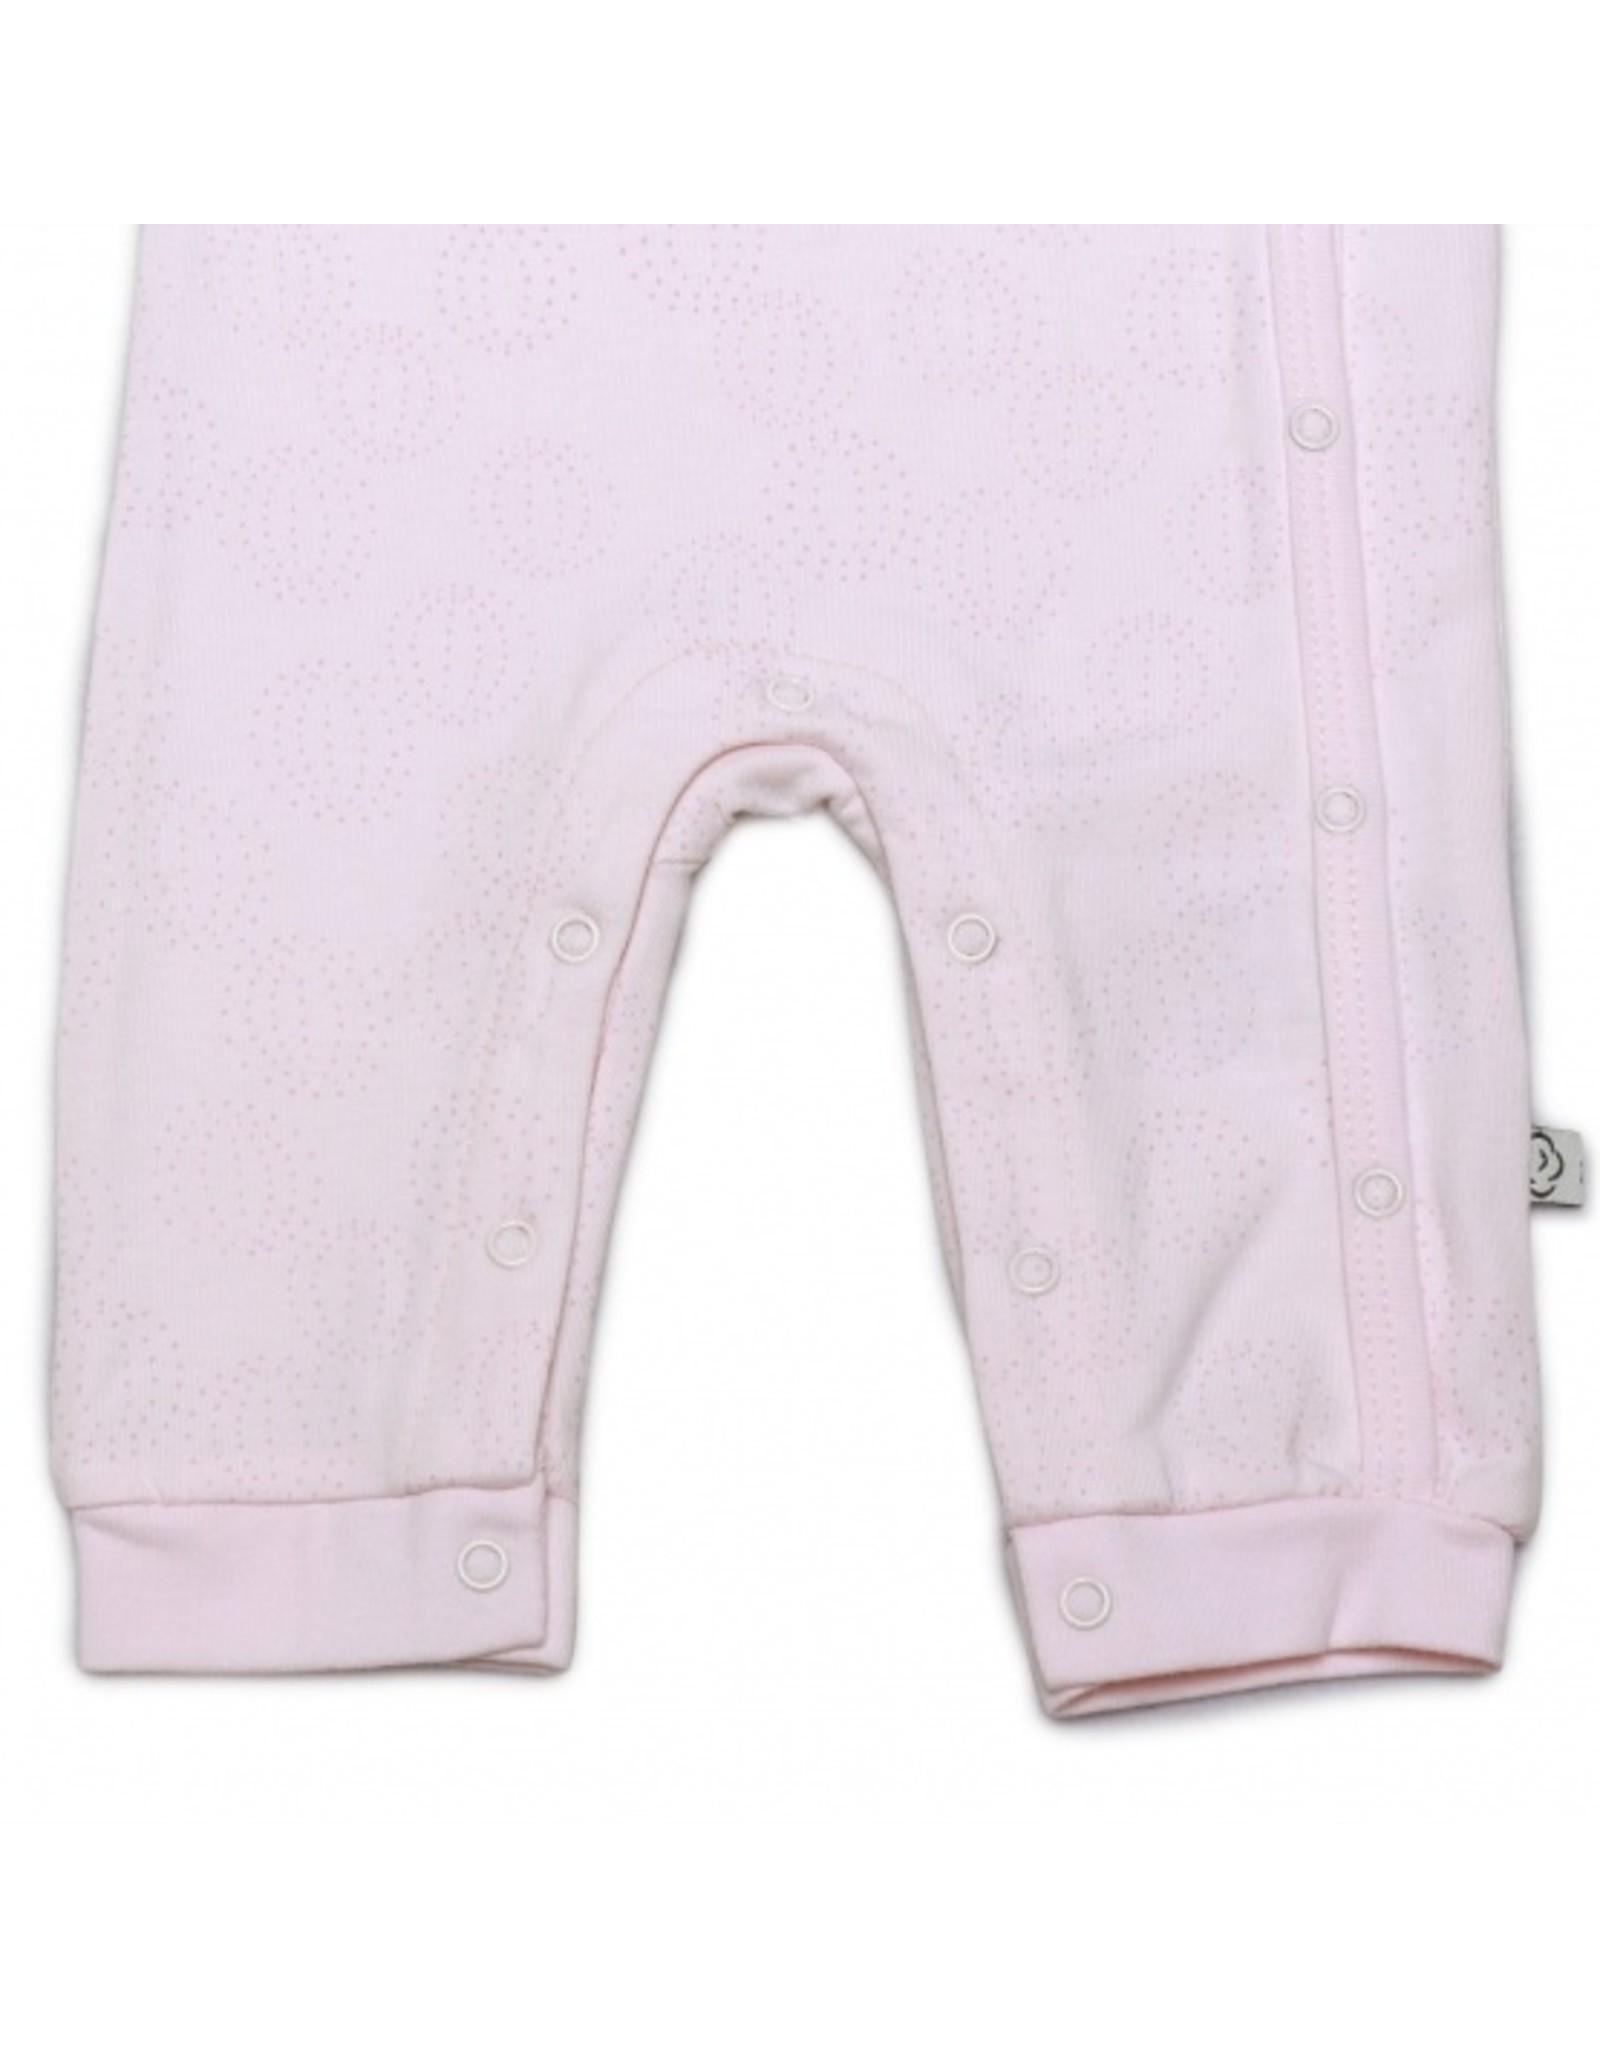 Pippi Pippi-Premature-Jumpsuit Wrap-Around-AOP Shrinking Violet